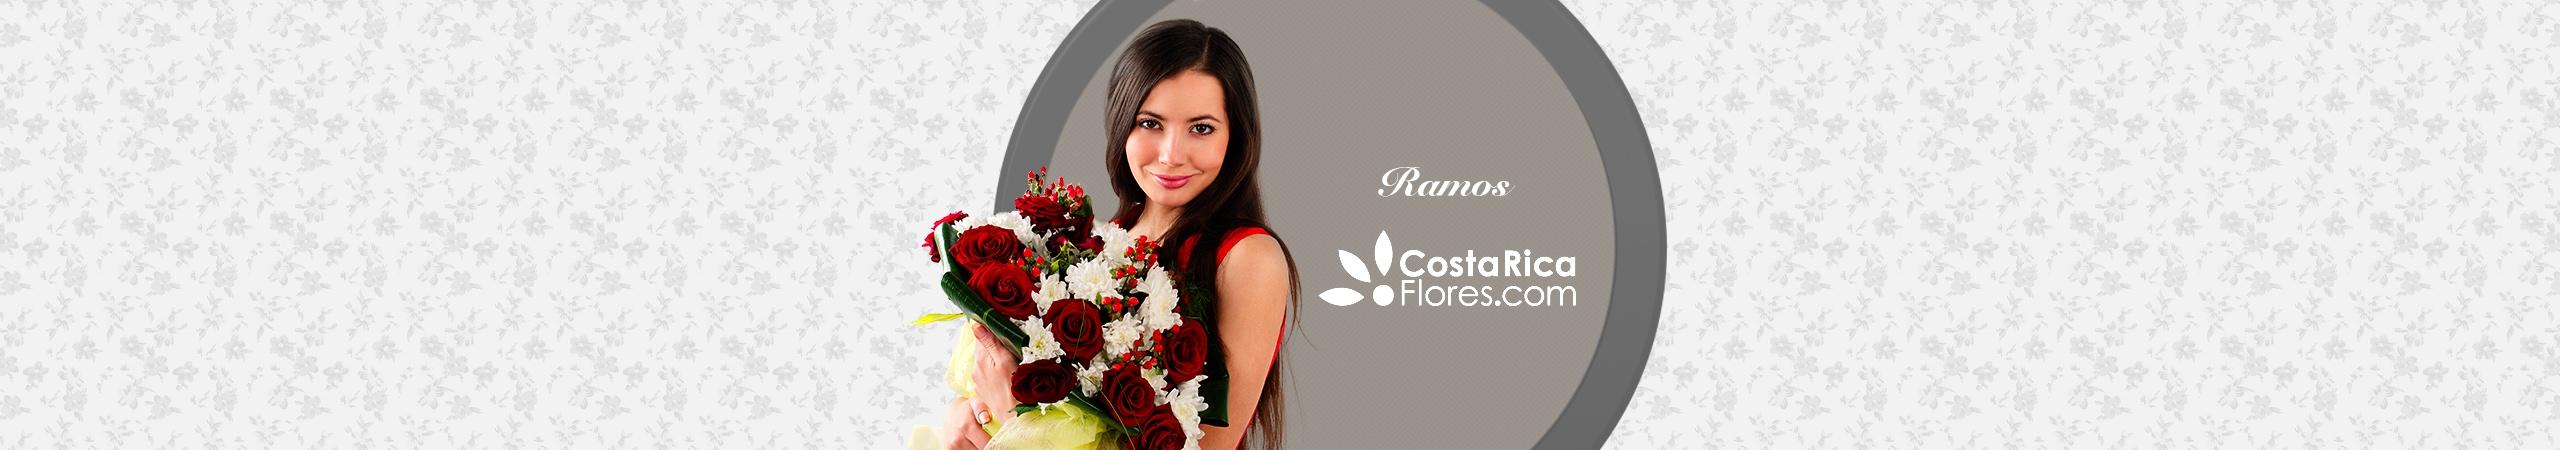 Bienvenido A Floristería Costa Rica Flores